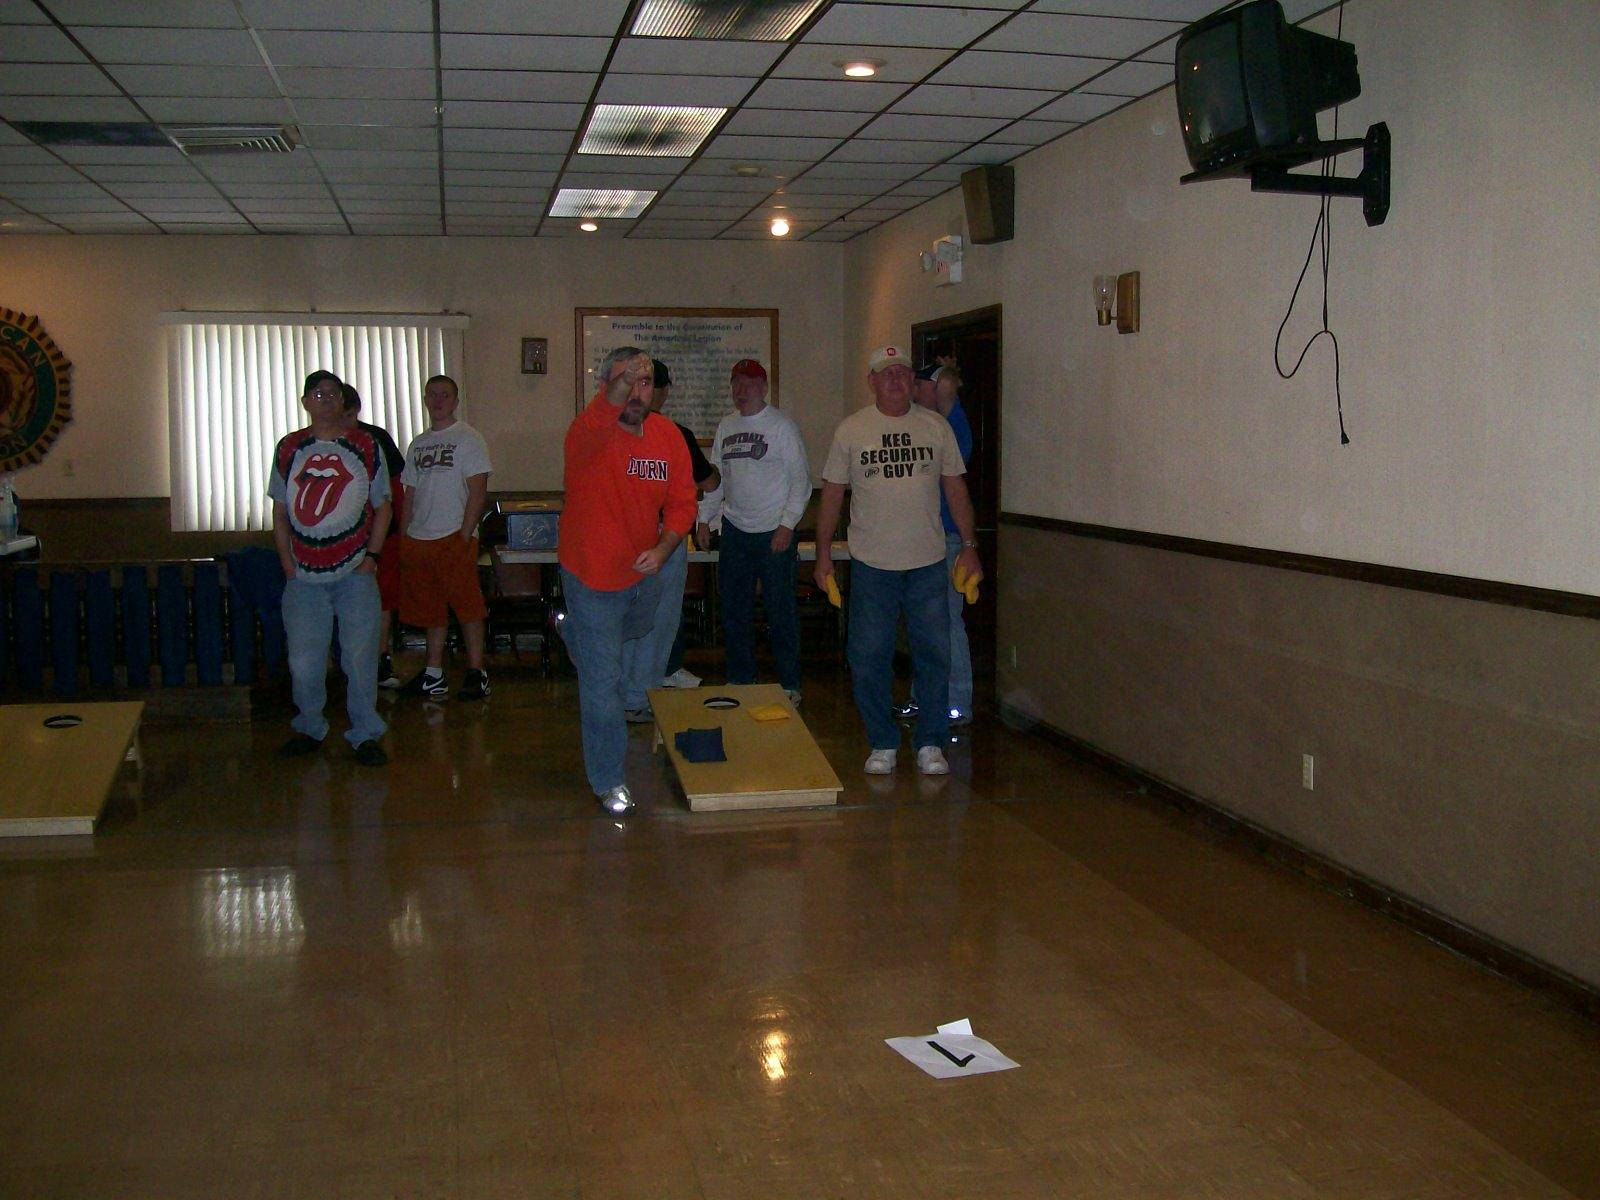 Ryan Birge and Ken Bigley  (Jan. 15, 2011)